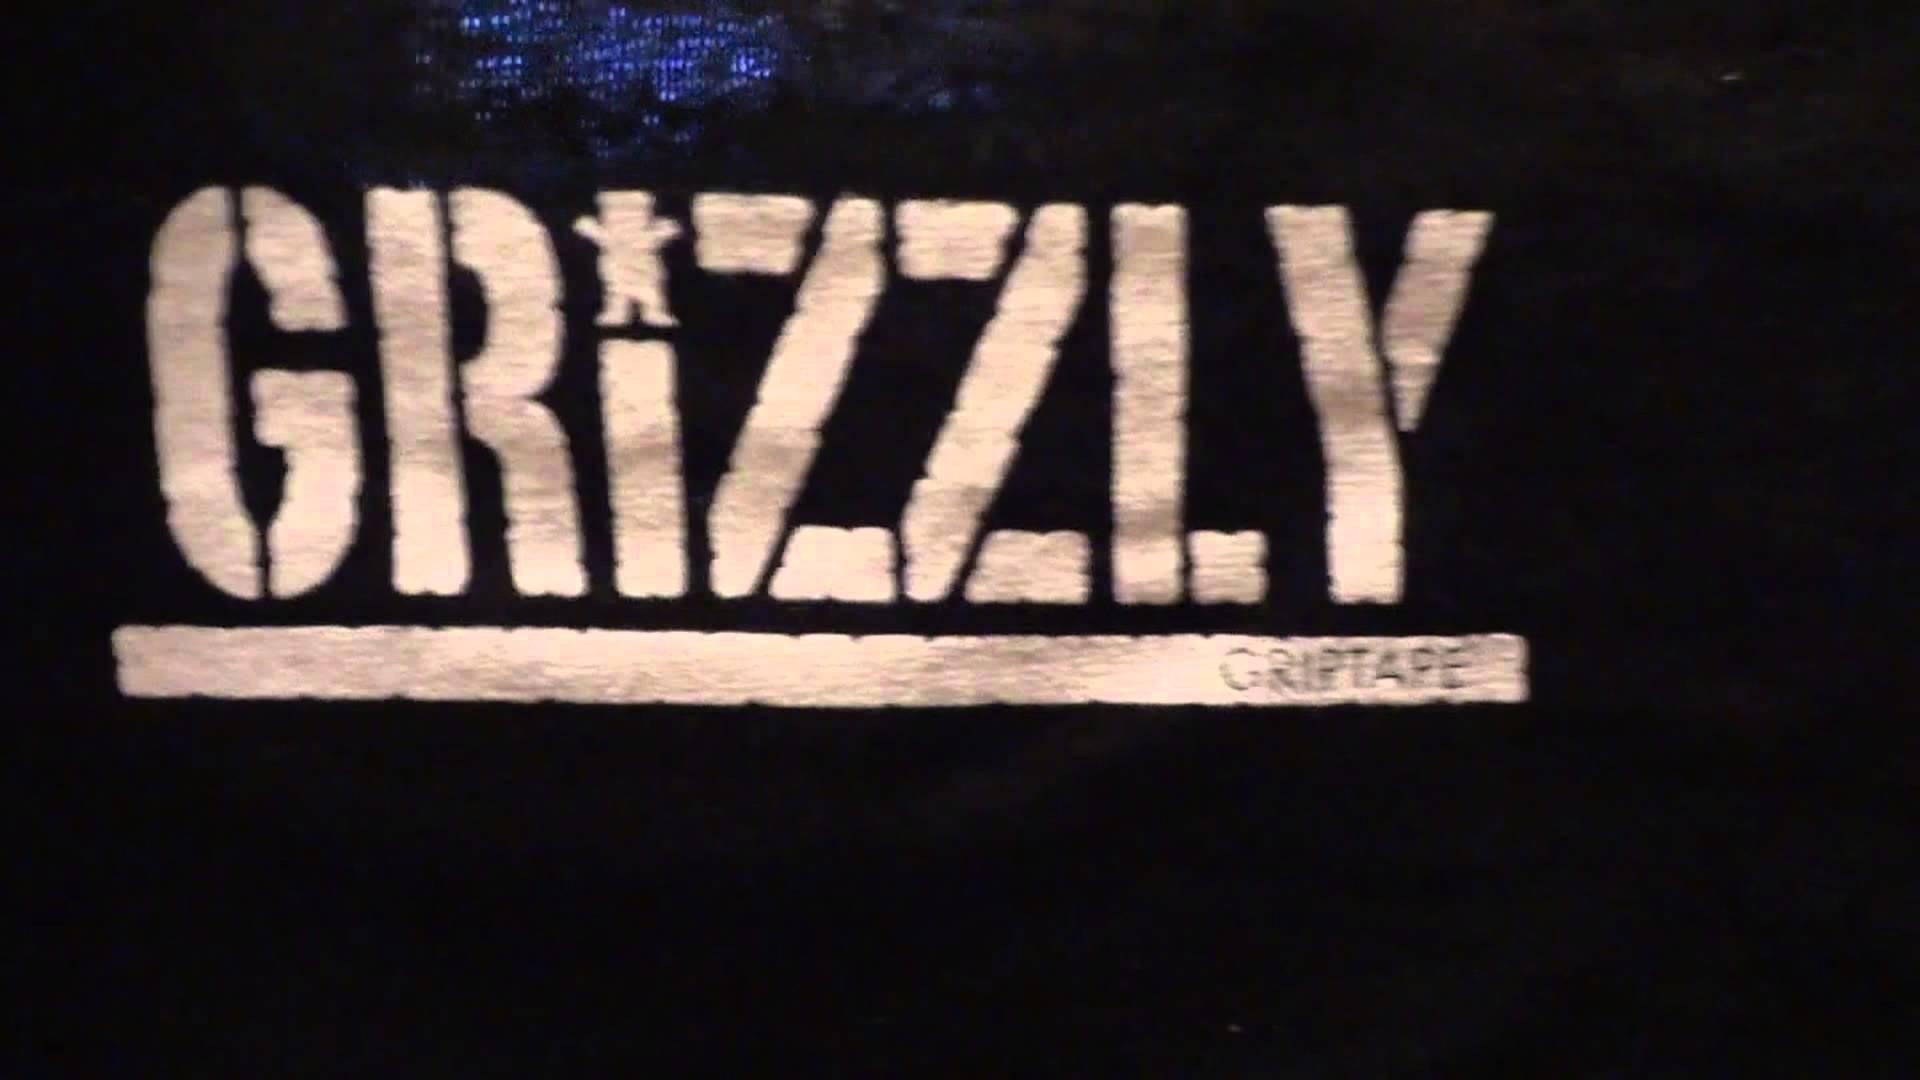 Grizzly Griptape Tie Dye Wallpaper Grizzly Griptap Pocketbear